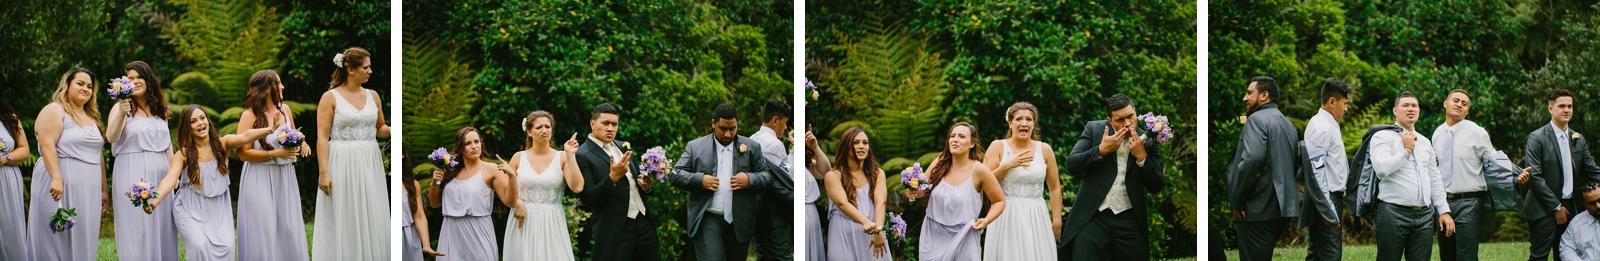 GabbyFiti_Auckland Wedding Photographer_Patty Lagera_0046.jpg